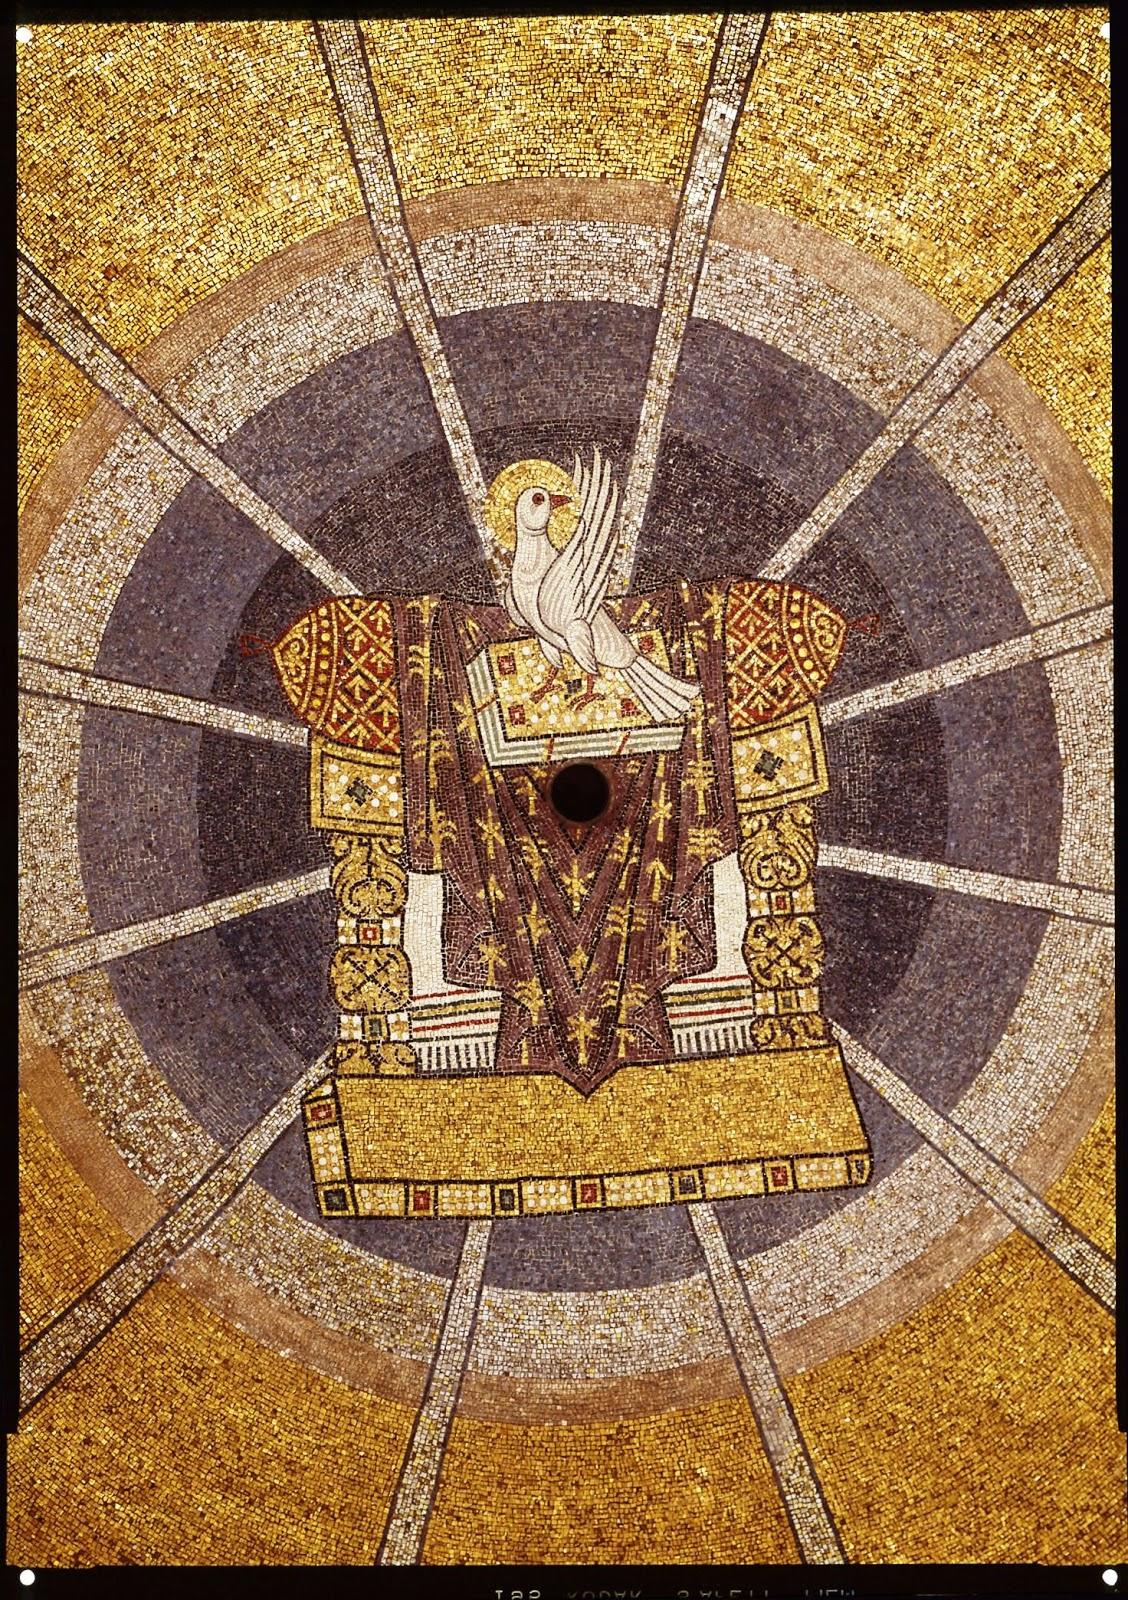 Venezia basilica di s marco mosaici xii xiv sec